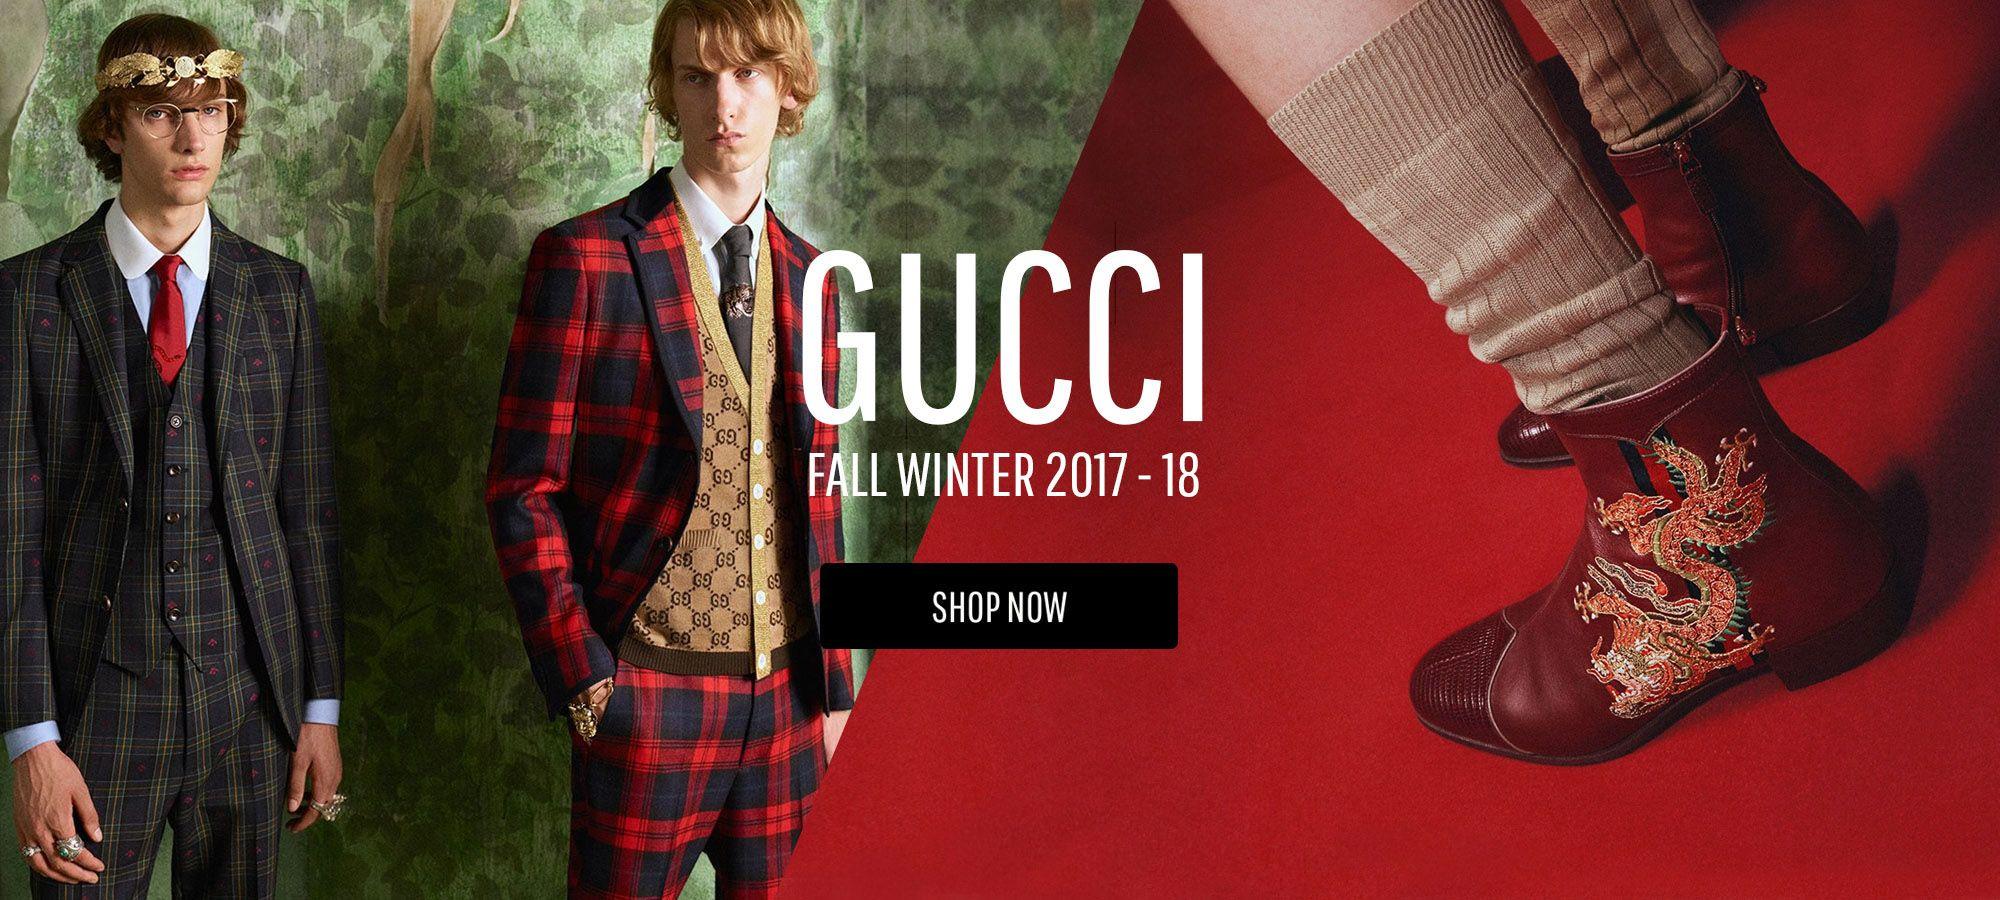 Gucci Men - Fall Winter 2017